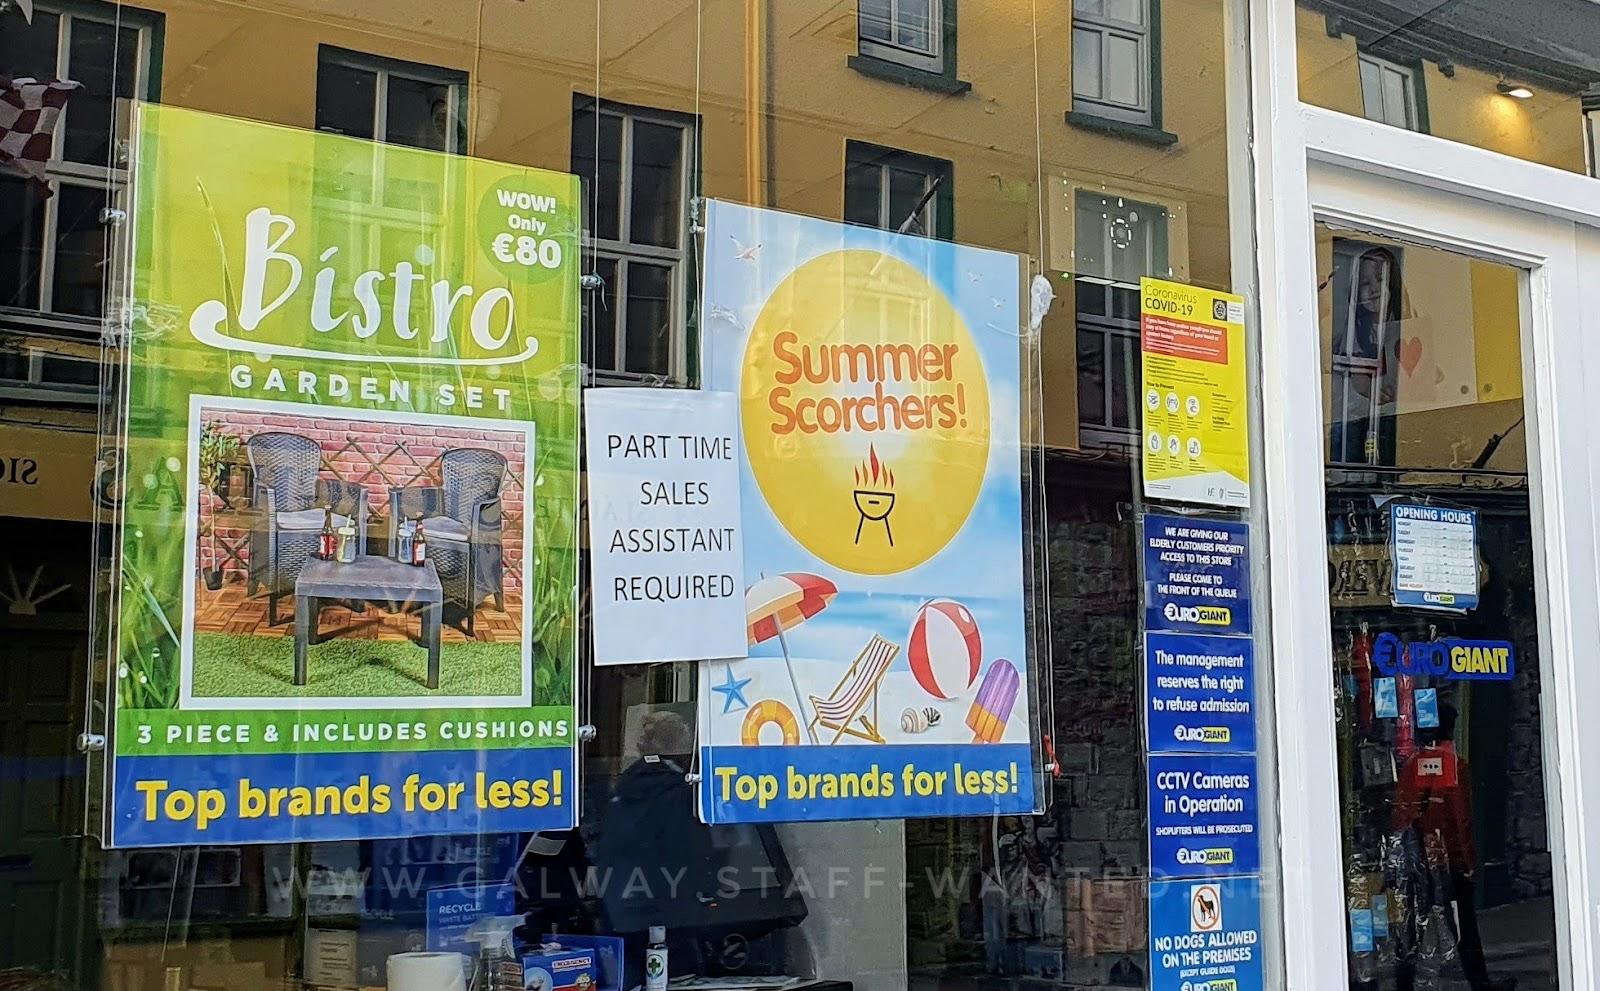 shop window signs in Euro Giant discount store:  Biistrol garden  3 piece furniture set